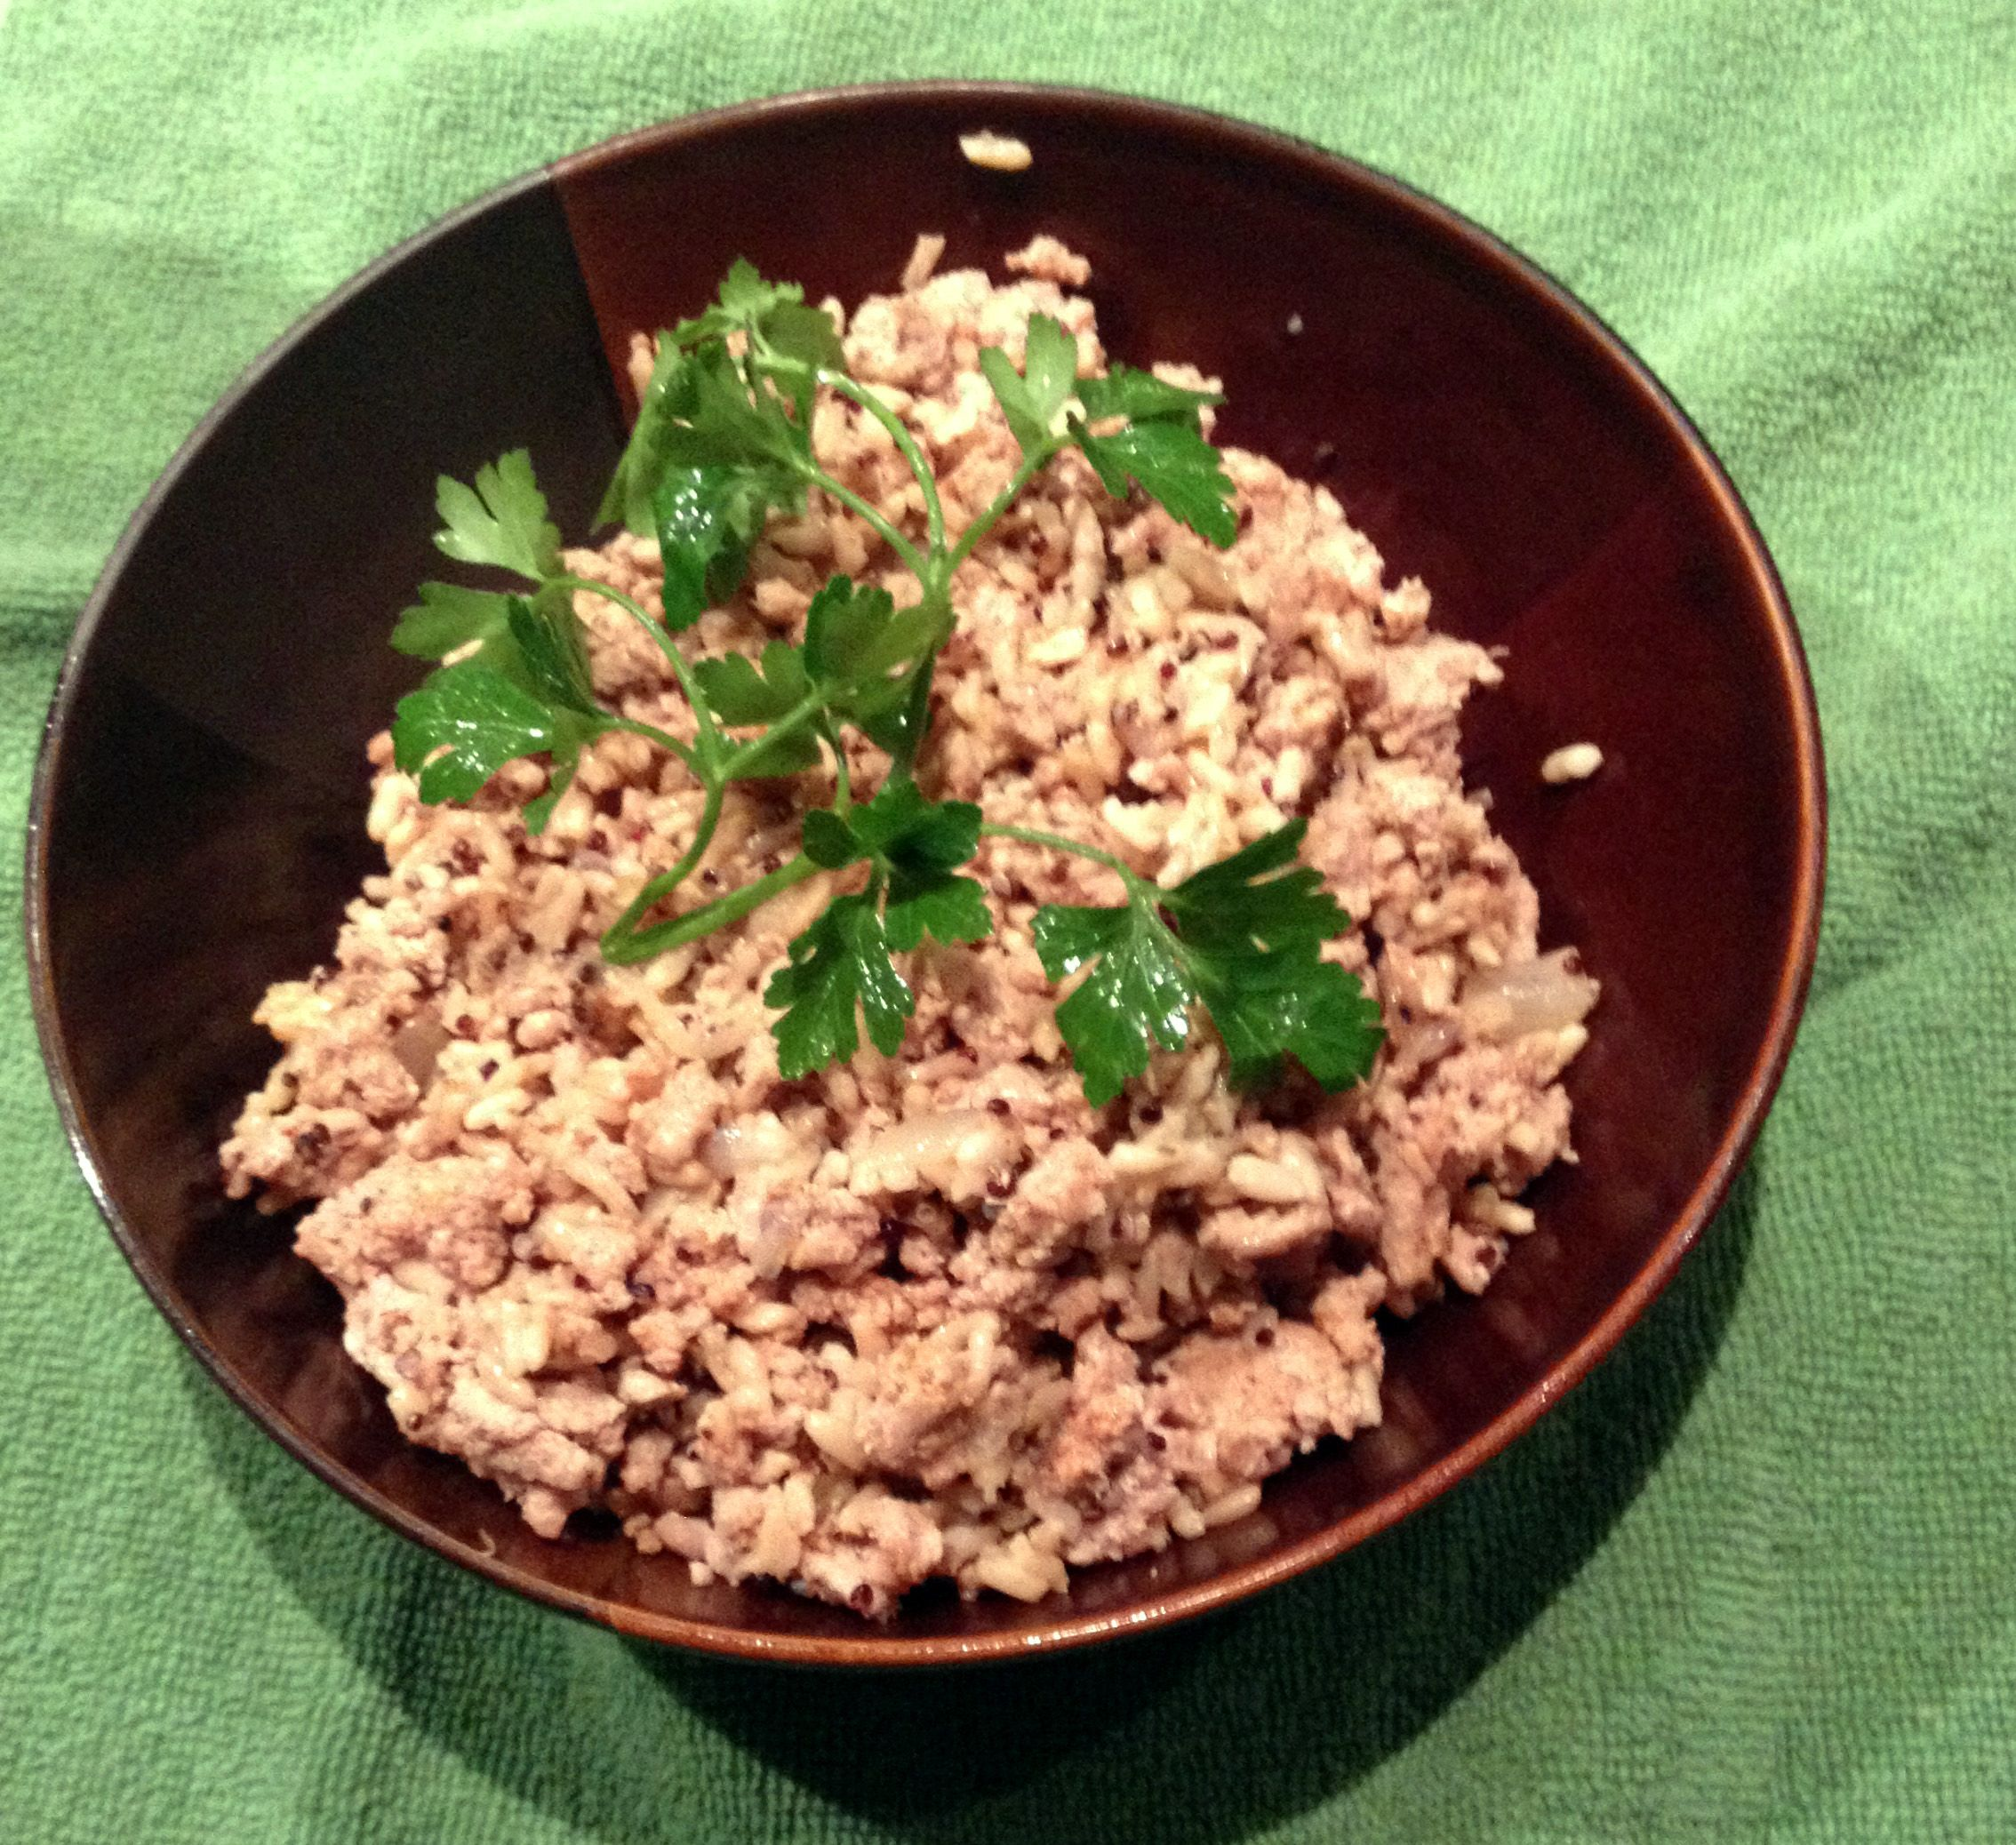 Ground turkey quinoa and brown rice bowl